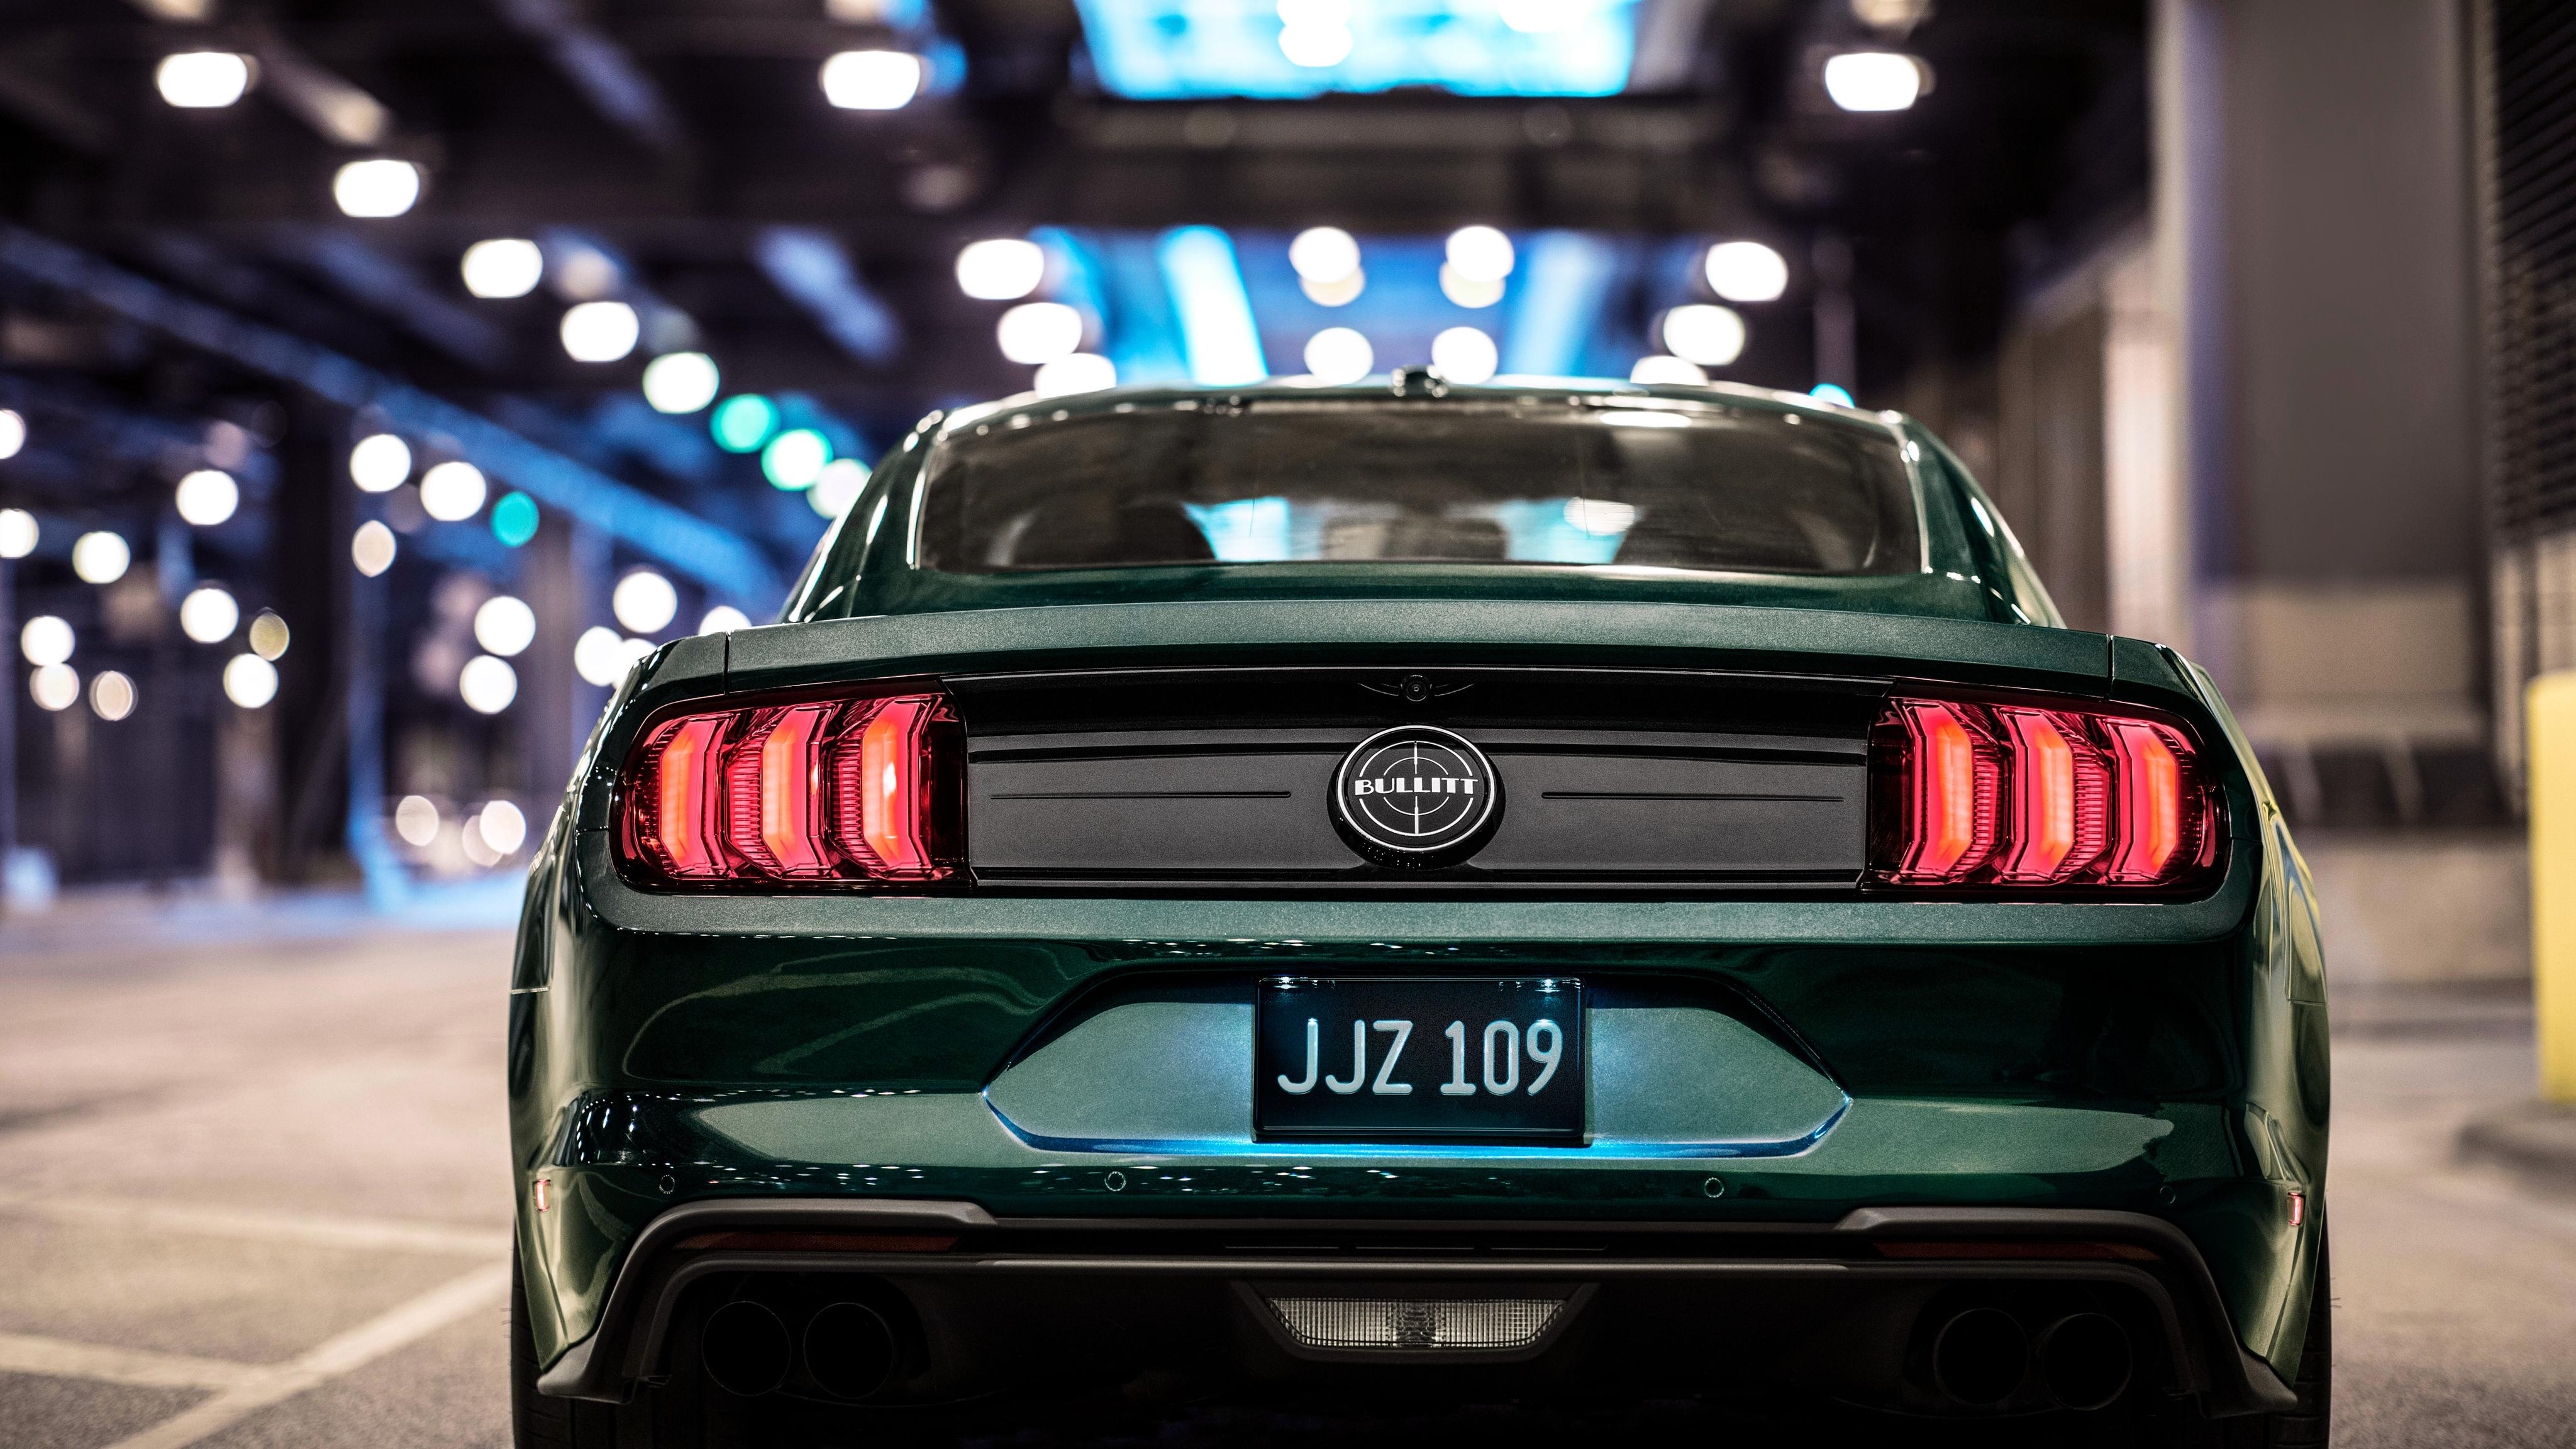 2018 Ford Mustang Bullitt 4K 2 Wallpaper | HD Car Wallpapers | ID #10082